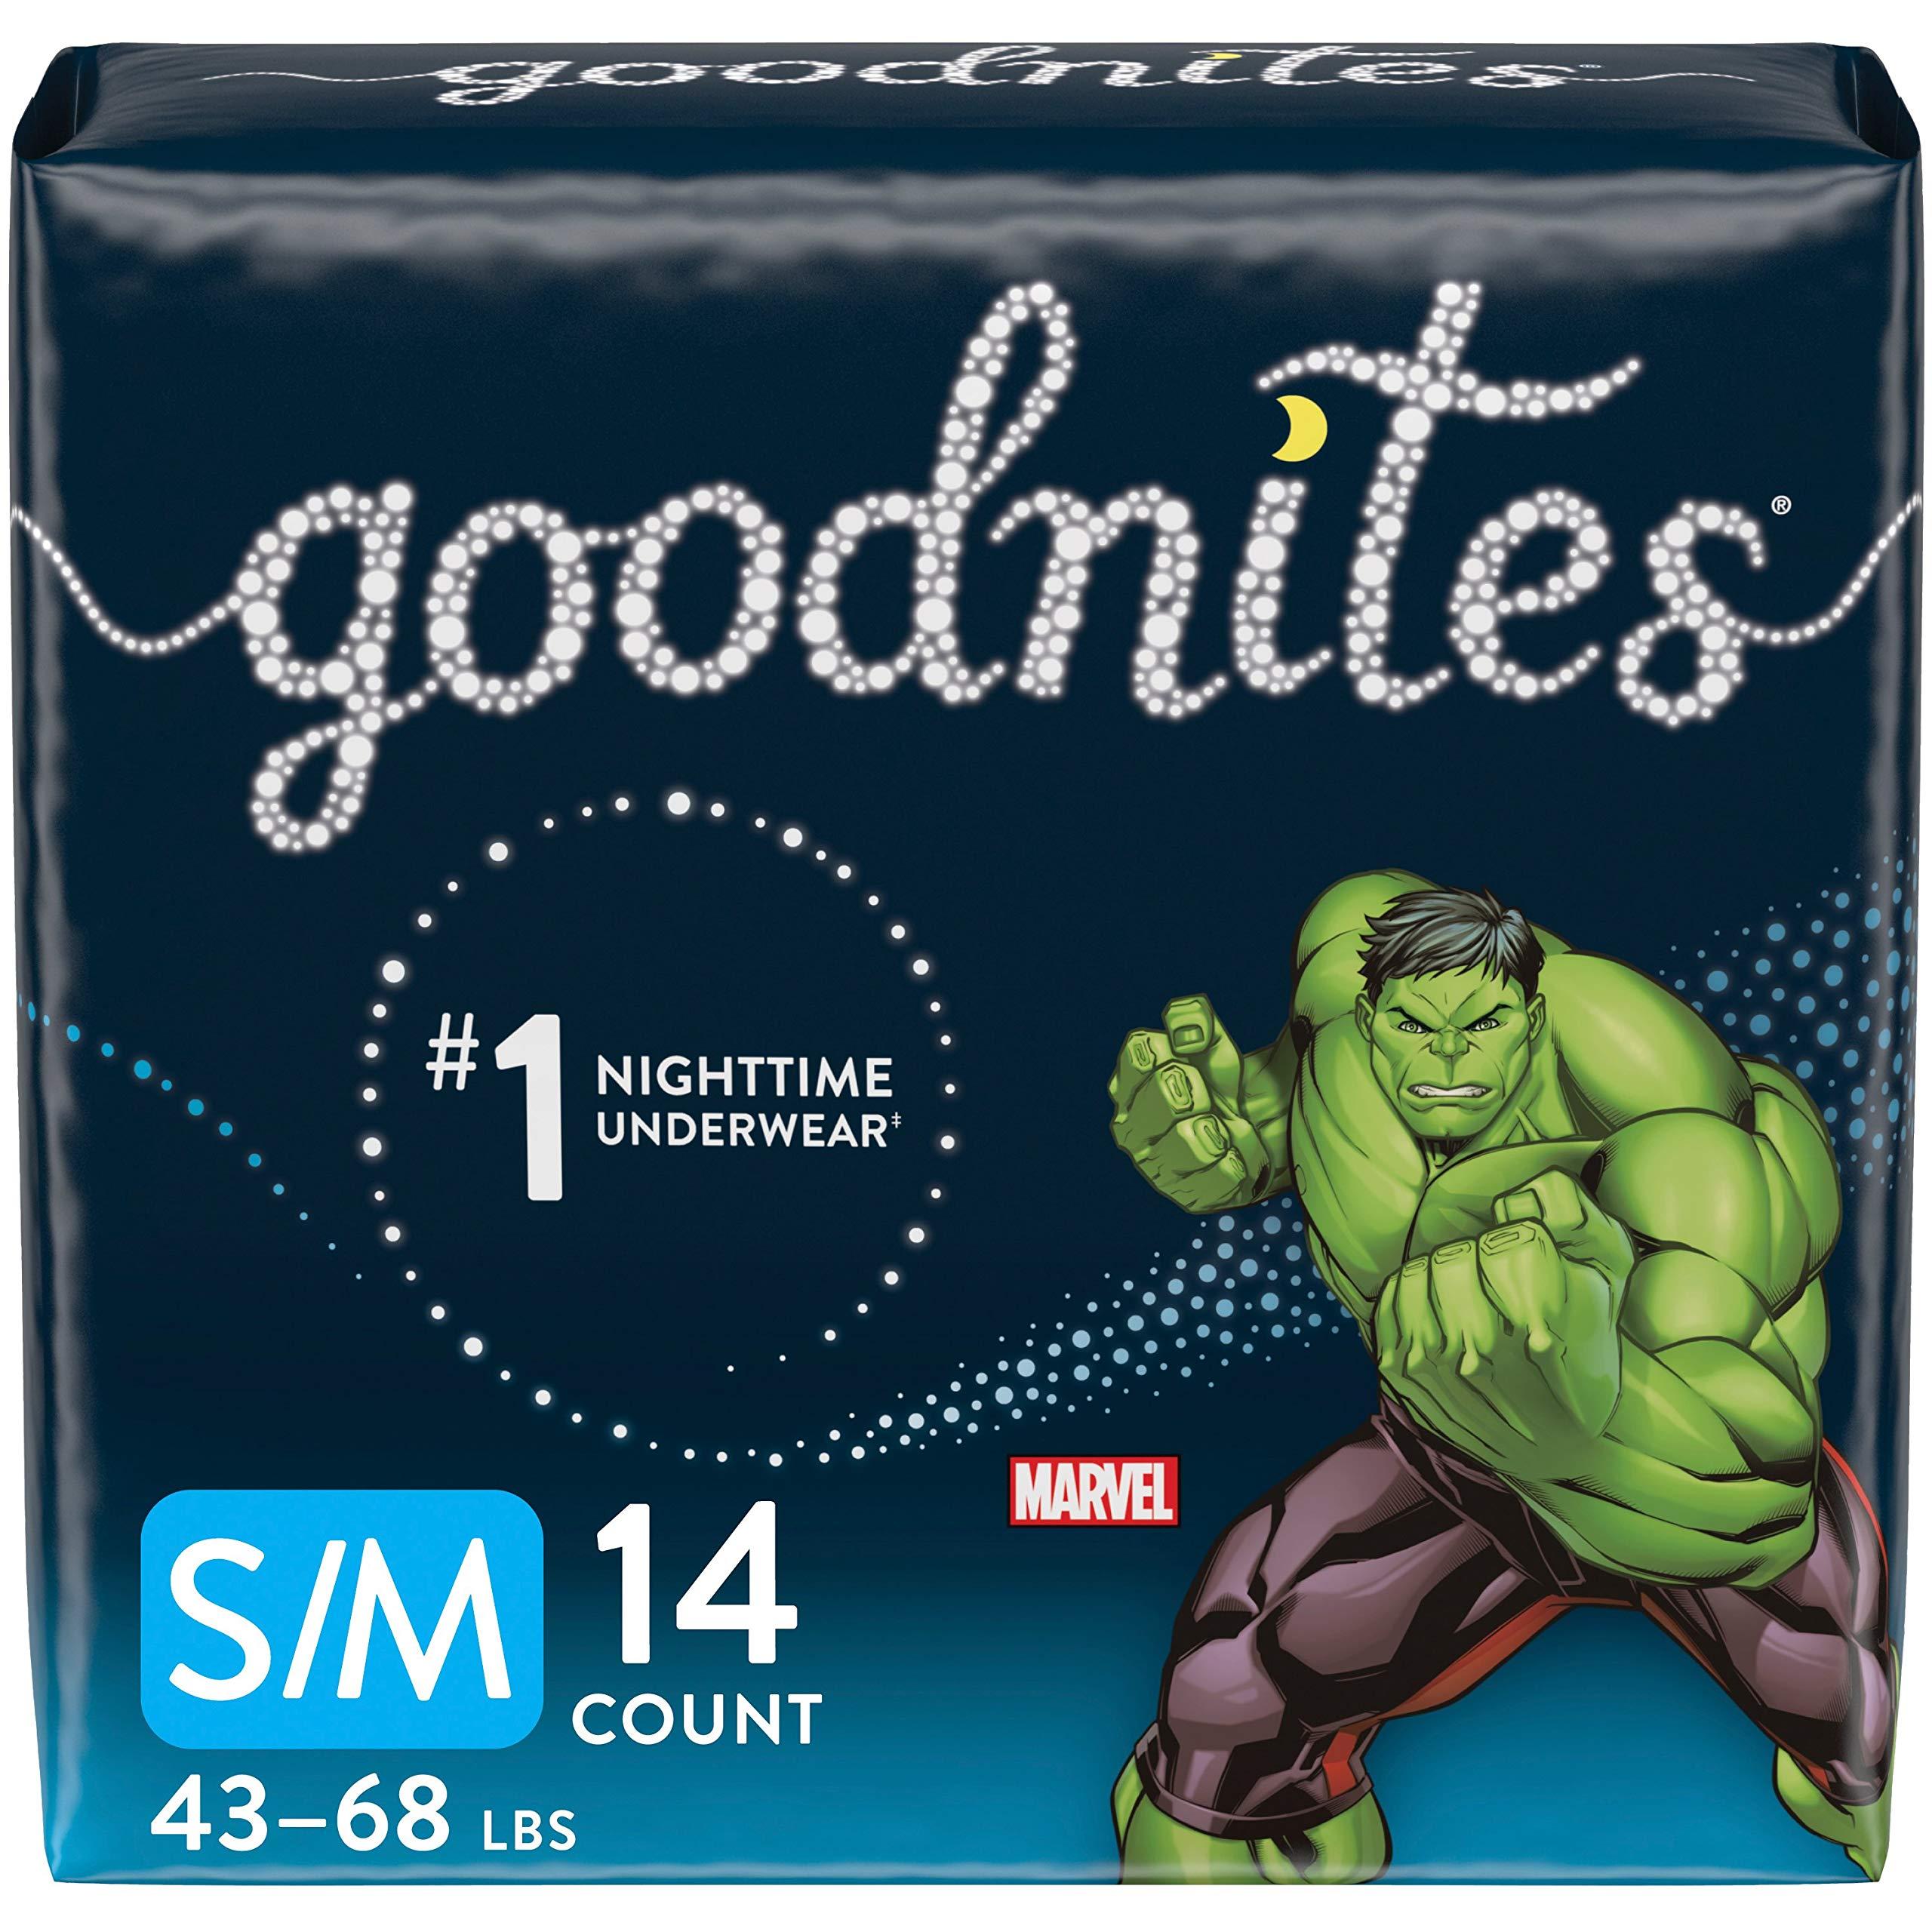 Goodnites, Boys Bedwetting Underwear, S/M, 14 Ct